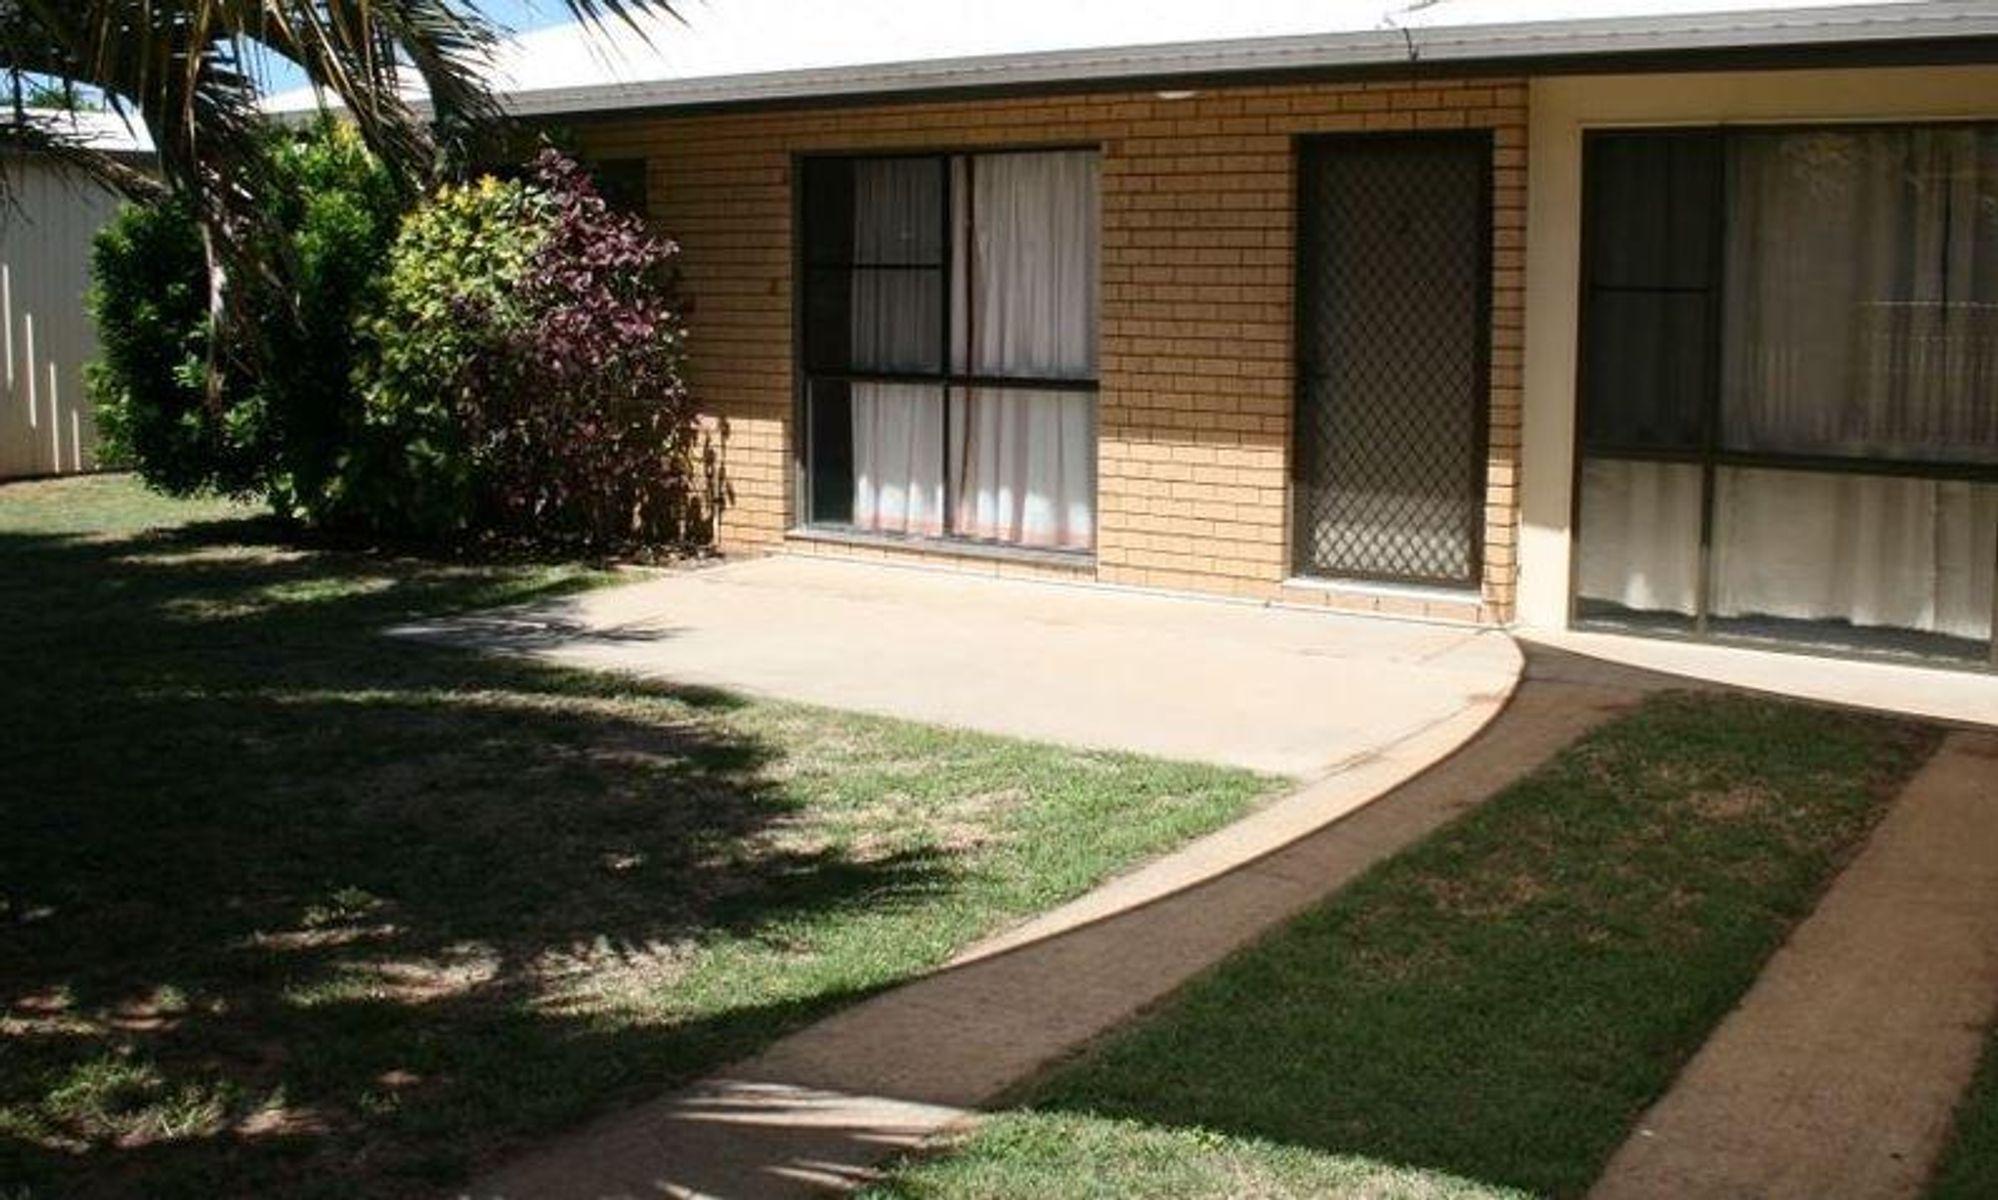 2/3 Carey Street, Hay Point, QLD 4740